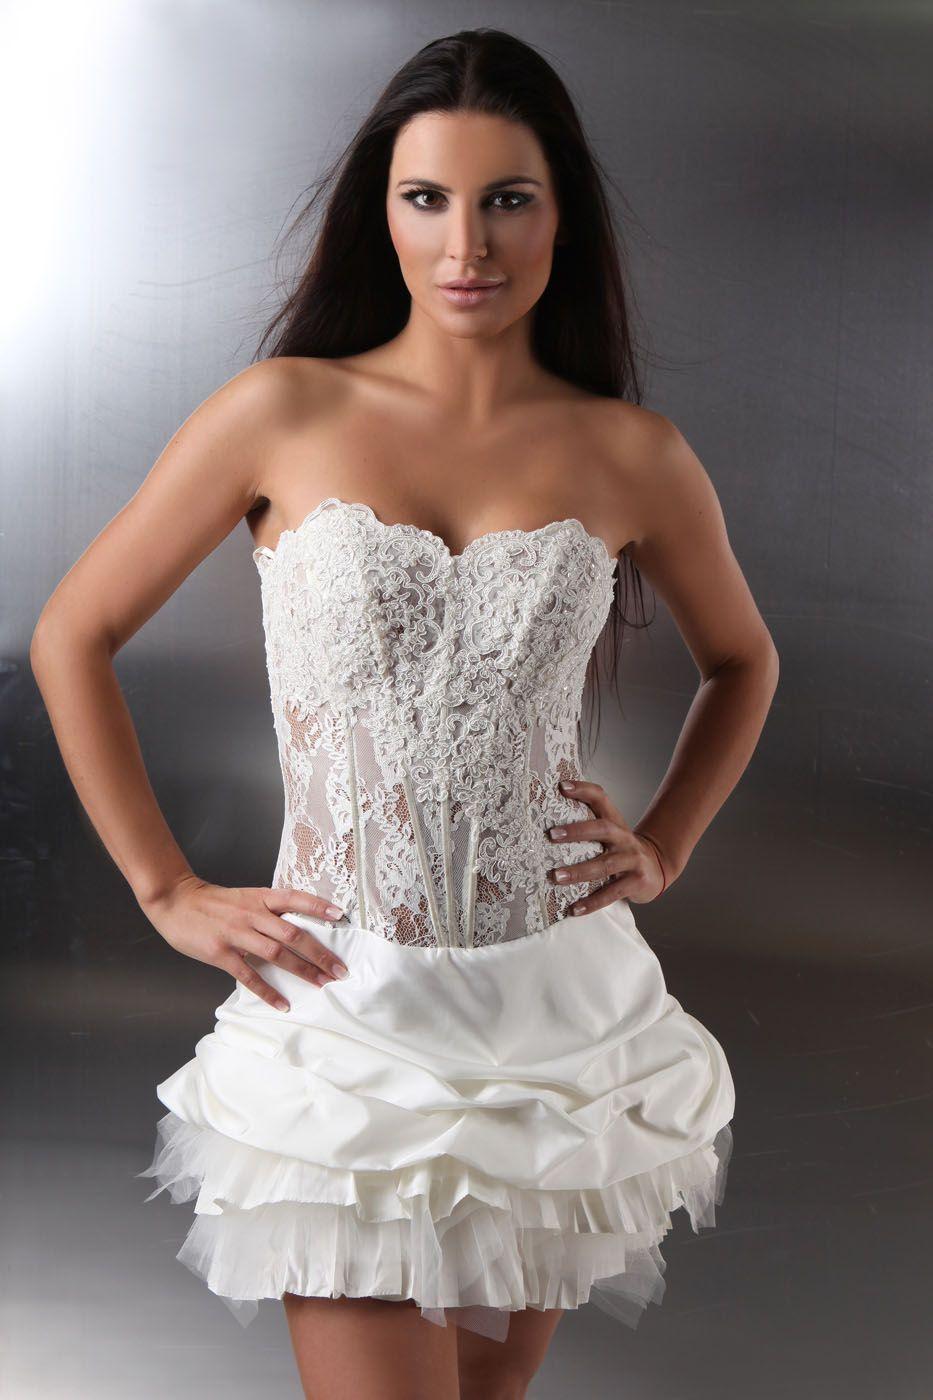 Kurzes Brautkleid sexy & extravagant transparente Korsage ...